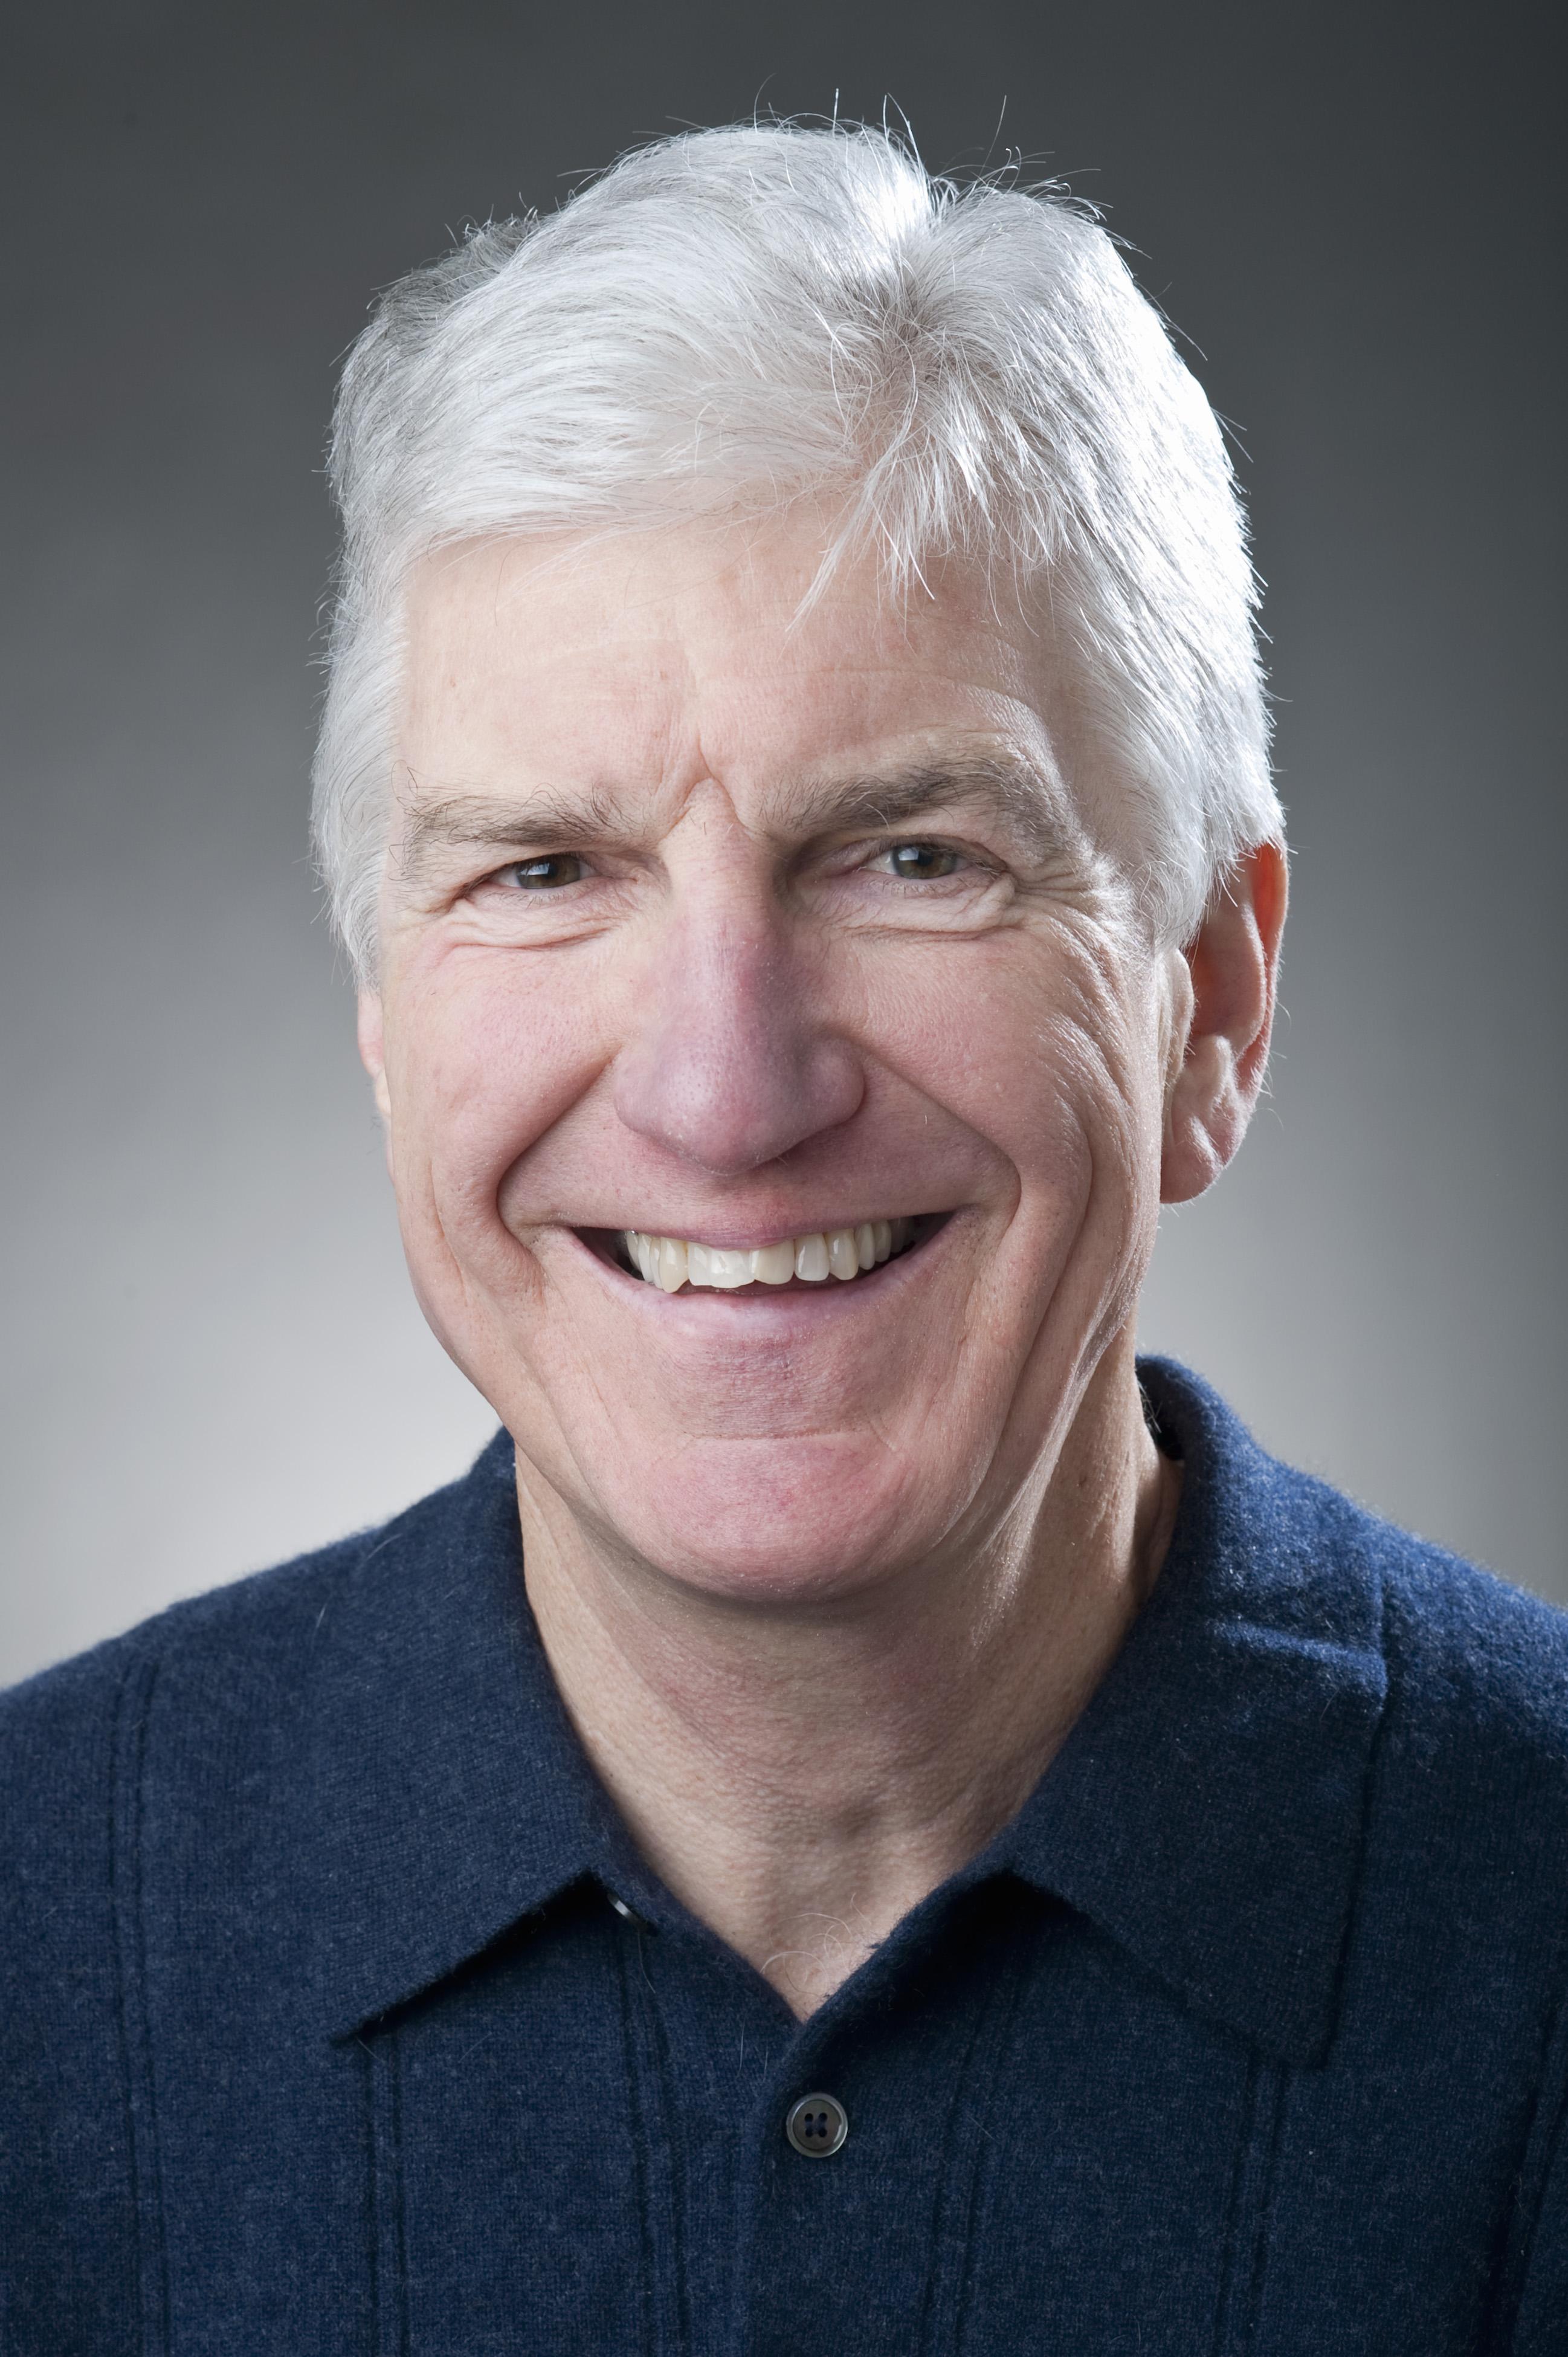 Robert-McGrath-University-of-Wisconsin-Madison